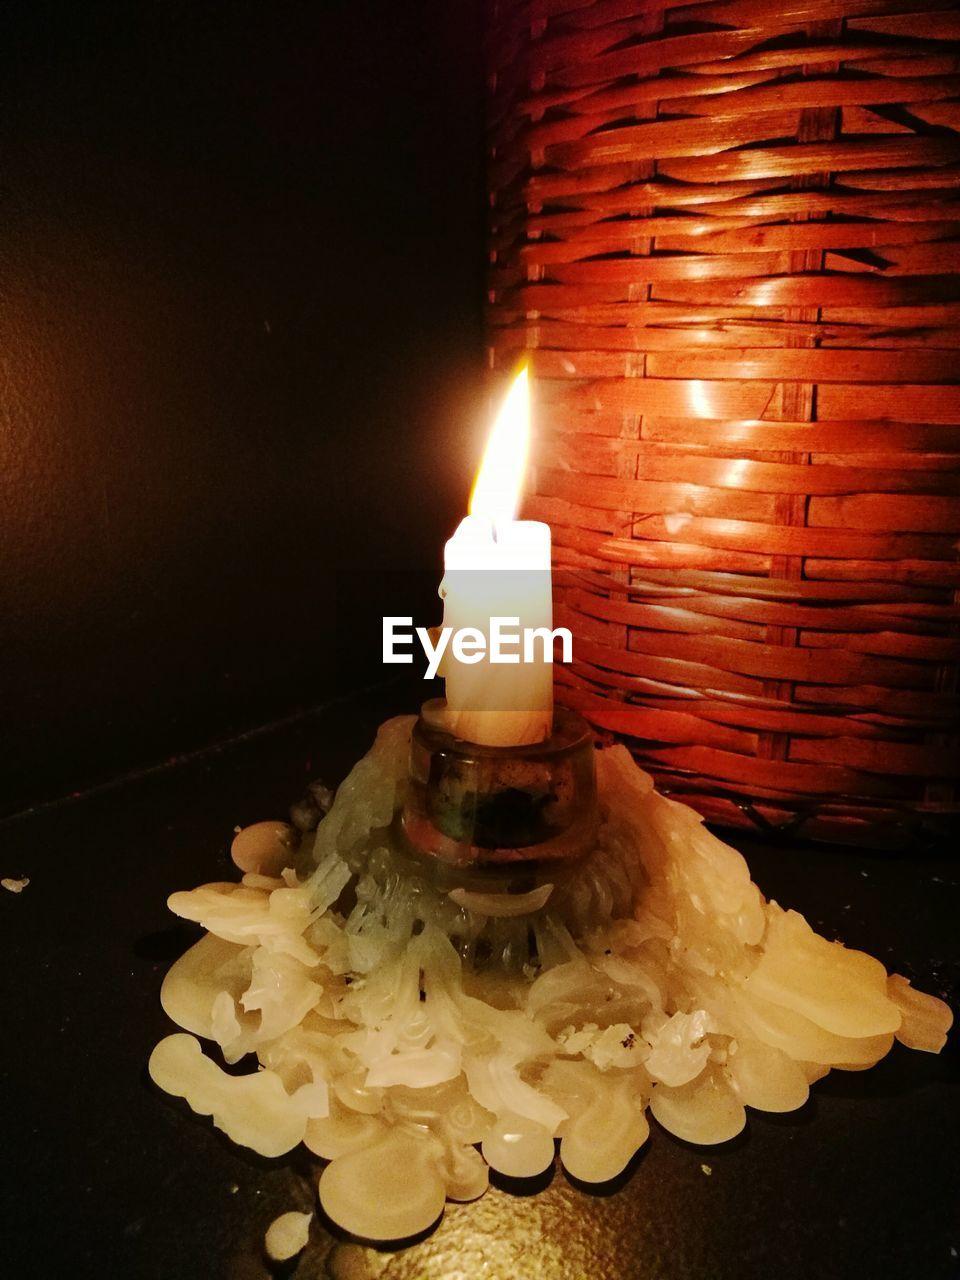 candle, flame, burning, illuminated, heat - temperature, glowing, indoors, tea light, close-up, no people, night